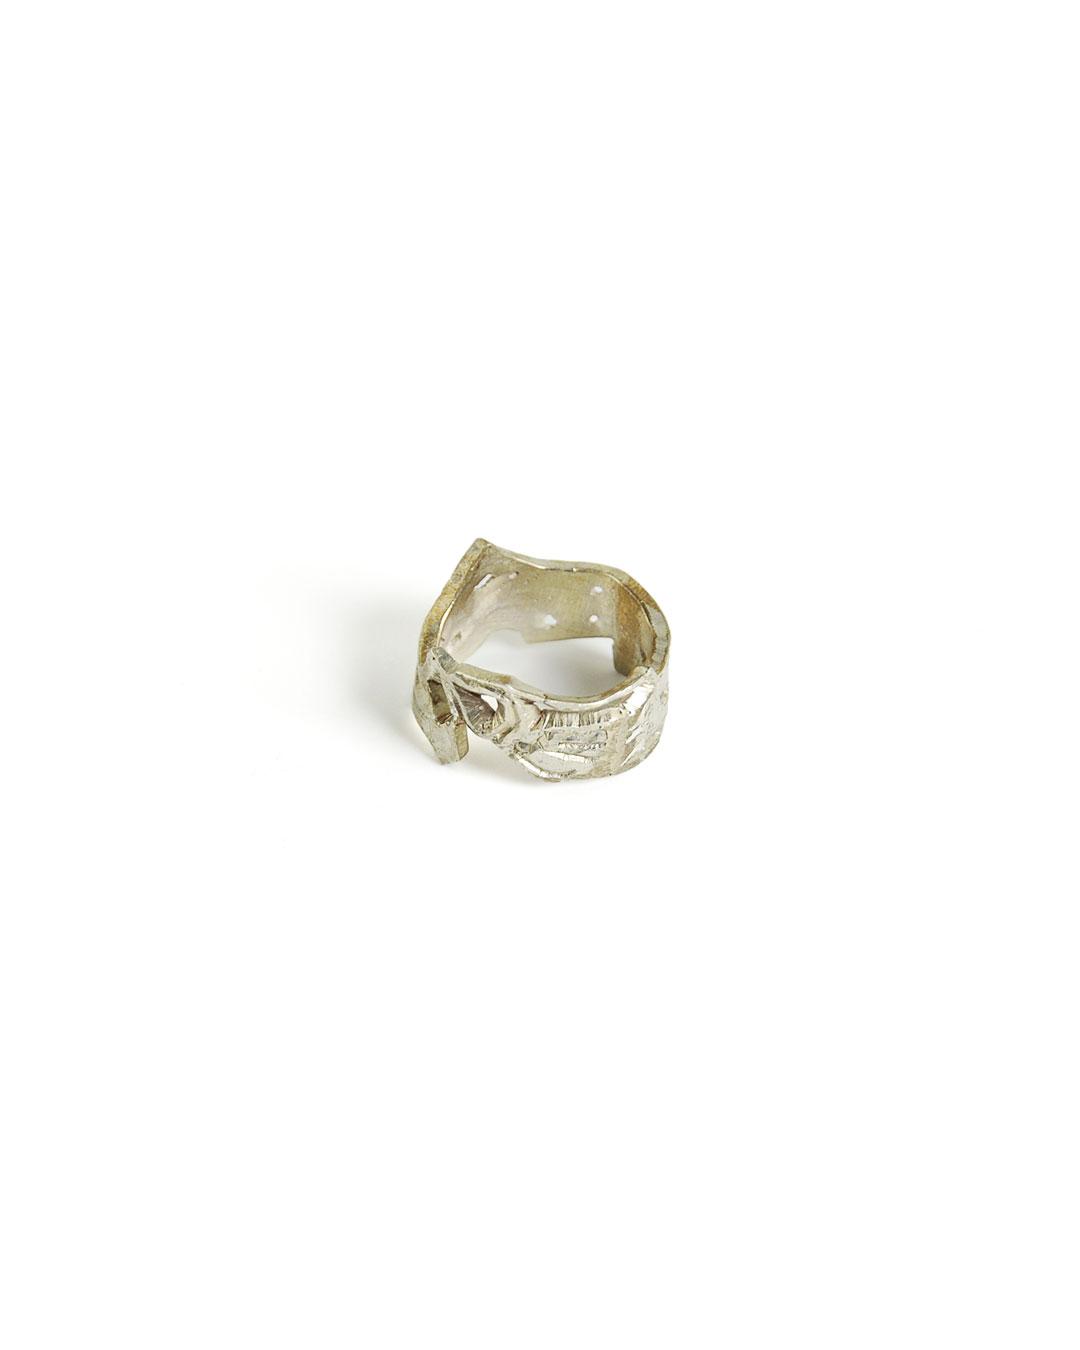 Rudolf Kocéa, untitled, 2014, ring; silver alloy, ø 23 x 15 mm, €680